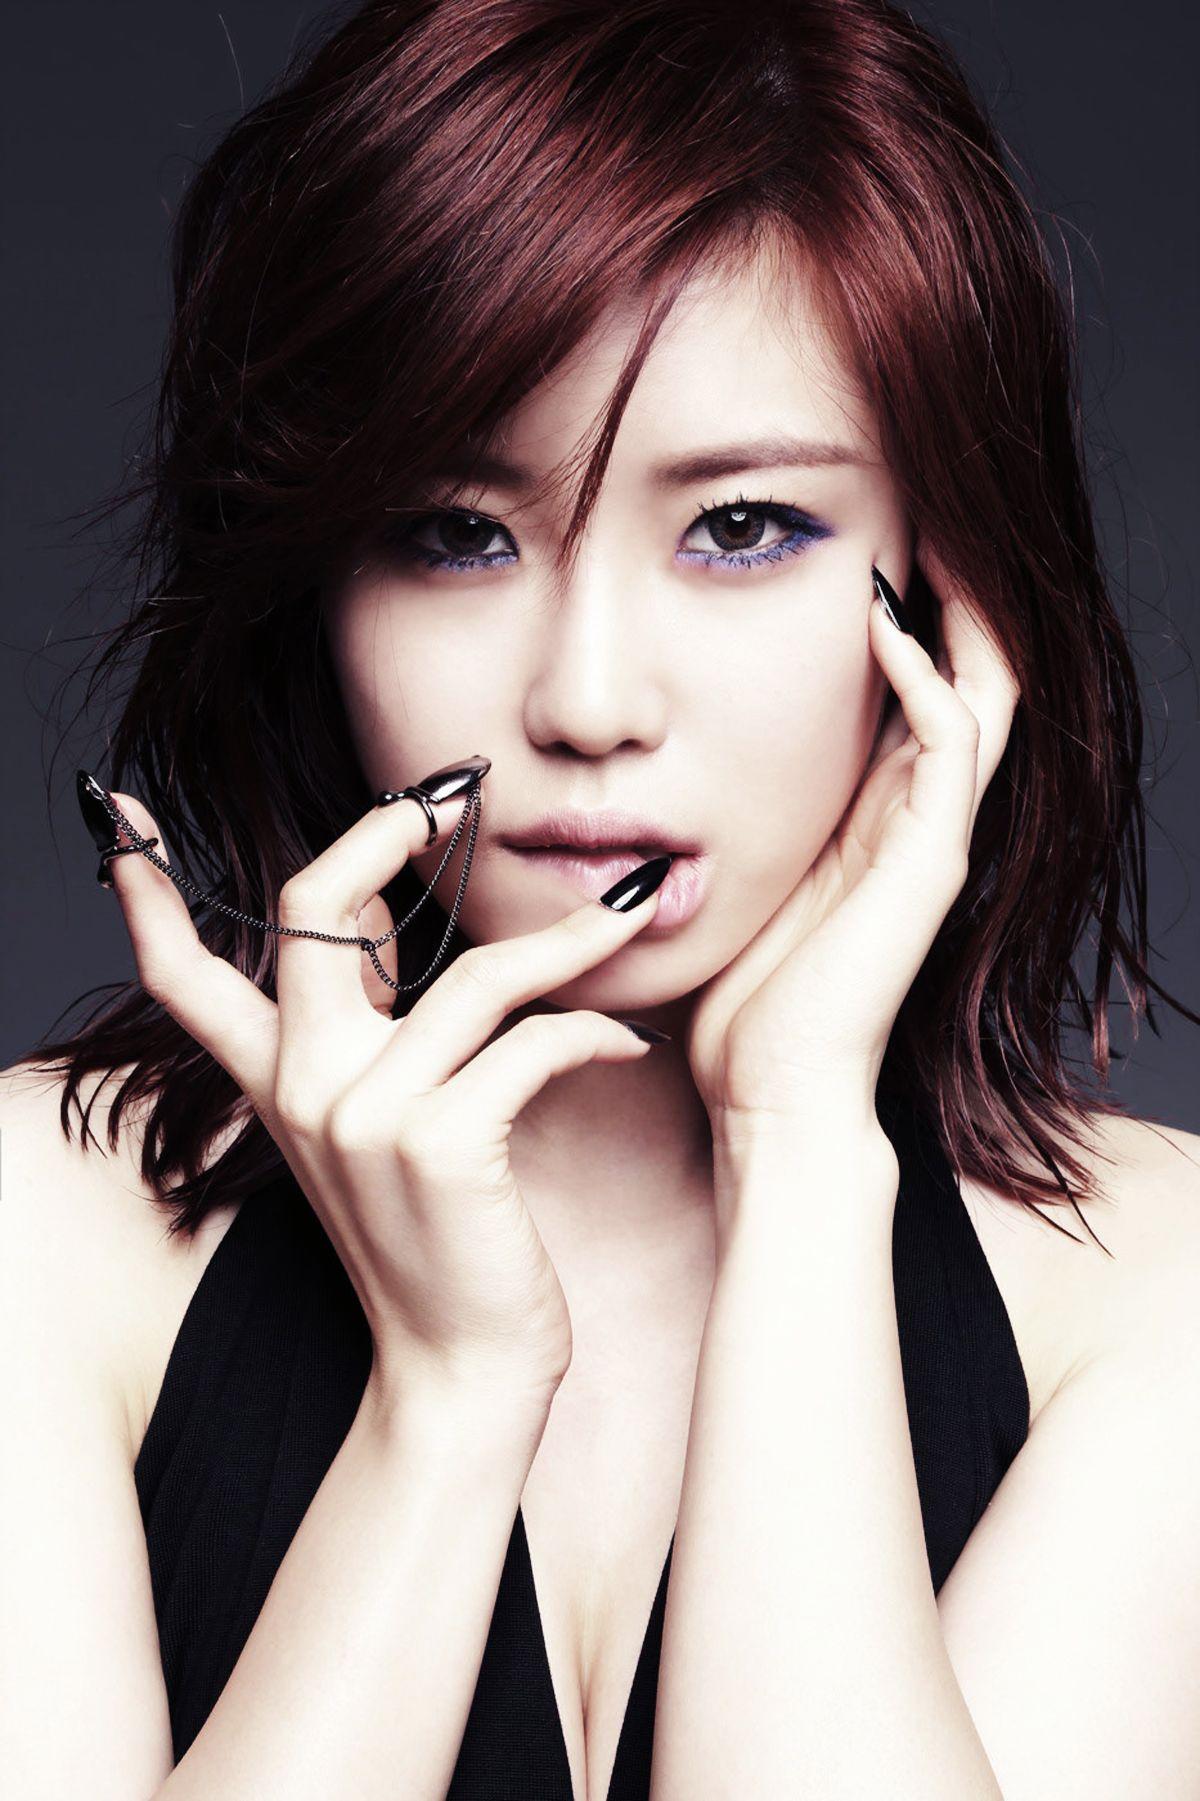 Hyosung Secret Hyosung Secret Girl Day